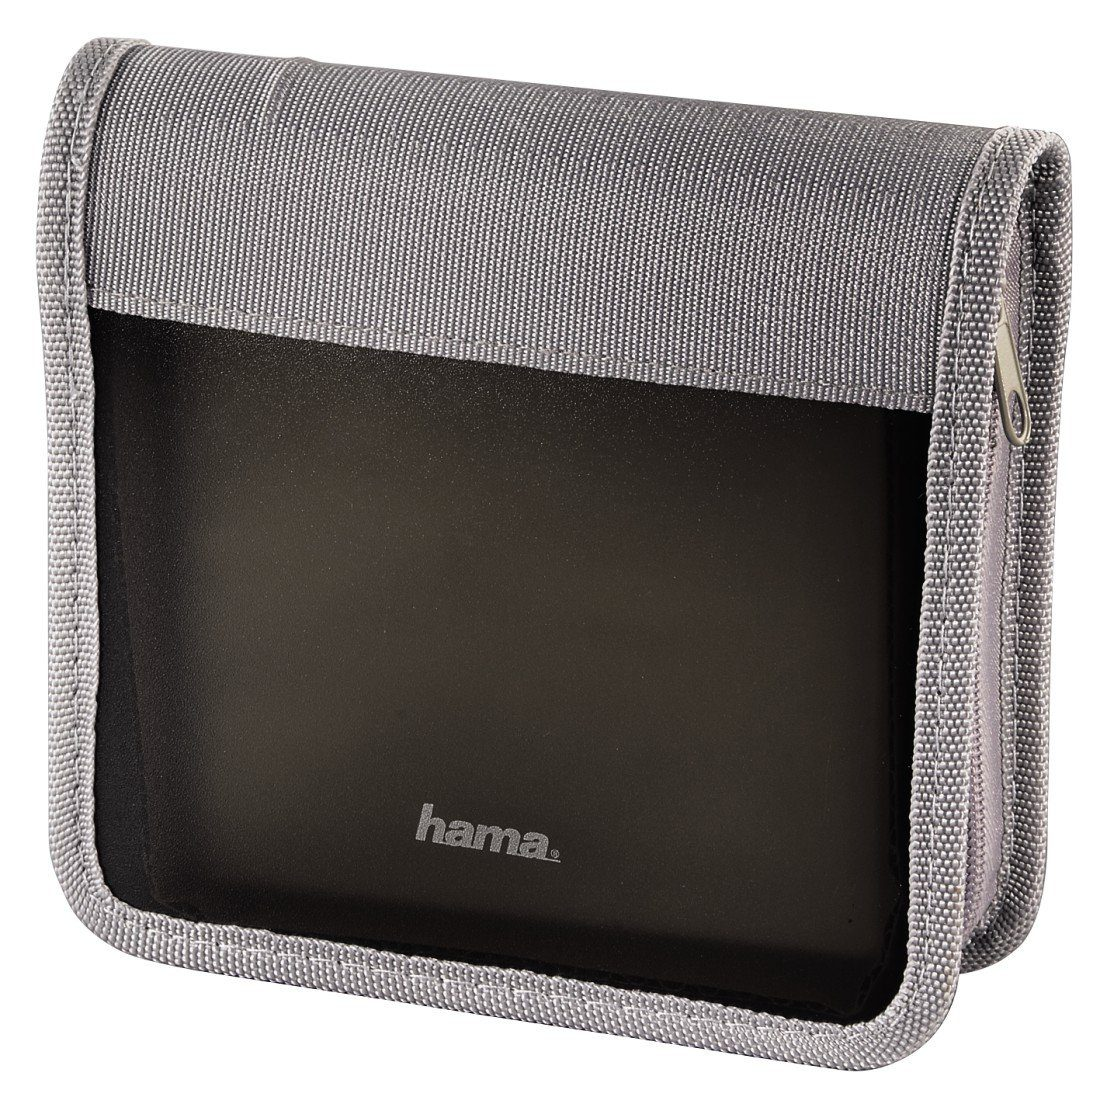 Hama CD-/DVD-/Blu-ray-Wallet 28, Graphit/Silber